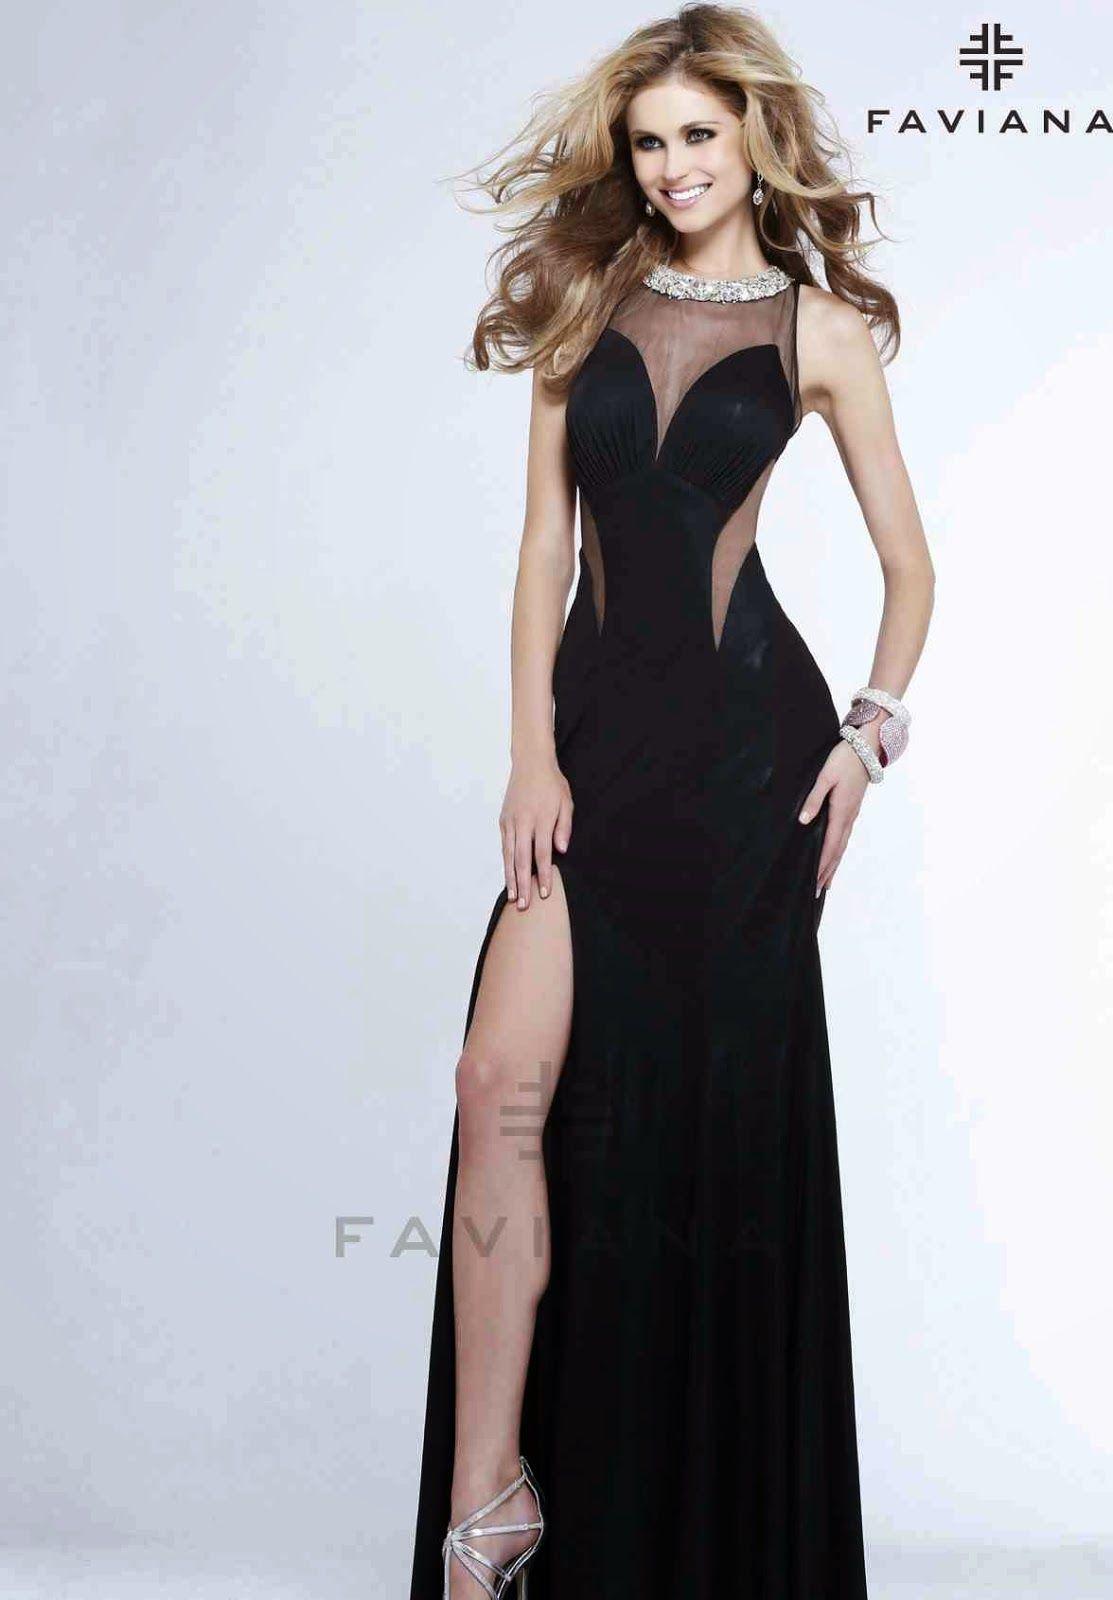 b8b3ef54d Moda para fiesta   Llamativos vestidos elegantes para fiesta ...